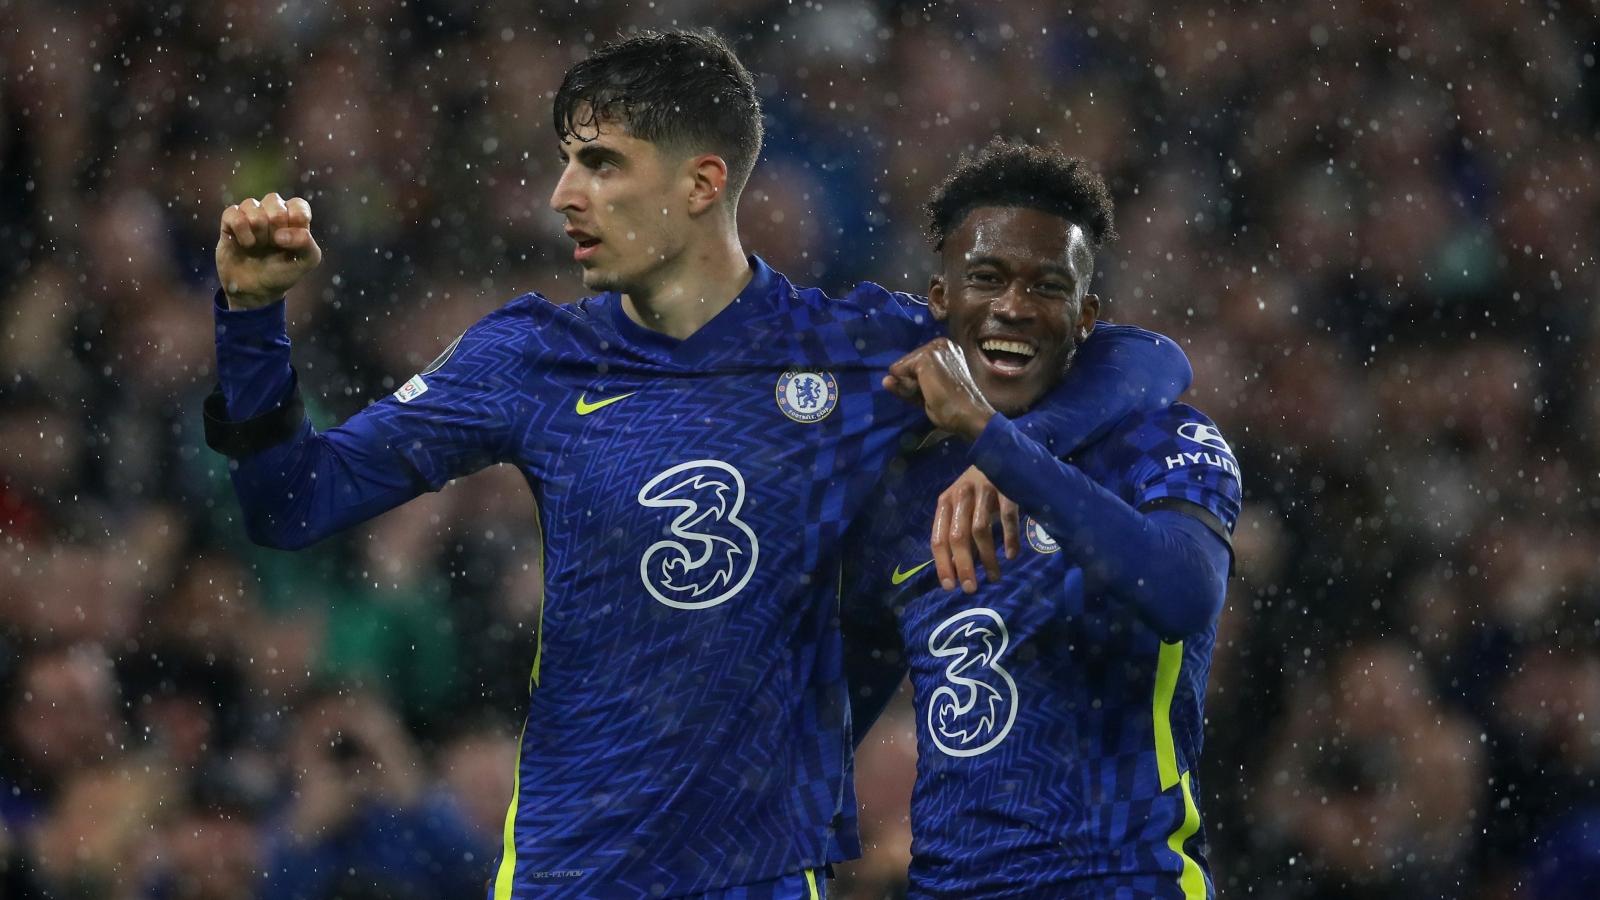 Chelsea 4-0 Malmo: Niềm vui không trọn vẹn của The Blues